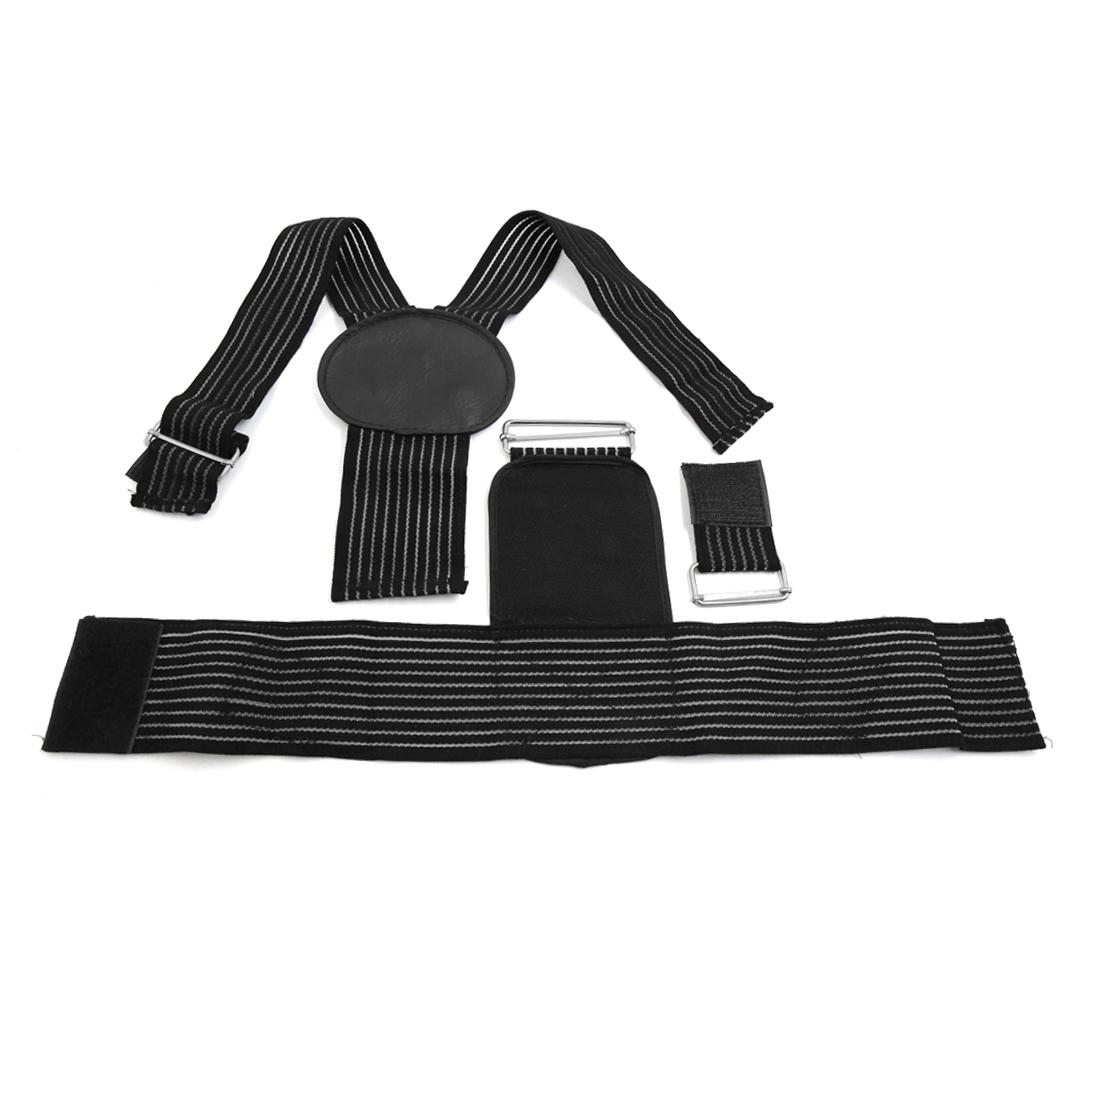 Unisex Black Adjustable Posture Correction Waist Body Shoulder Support Straighten Belt Brace